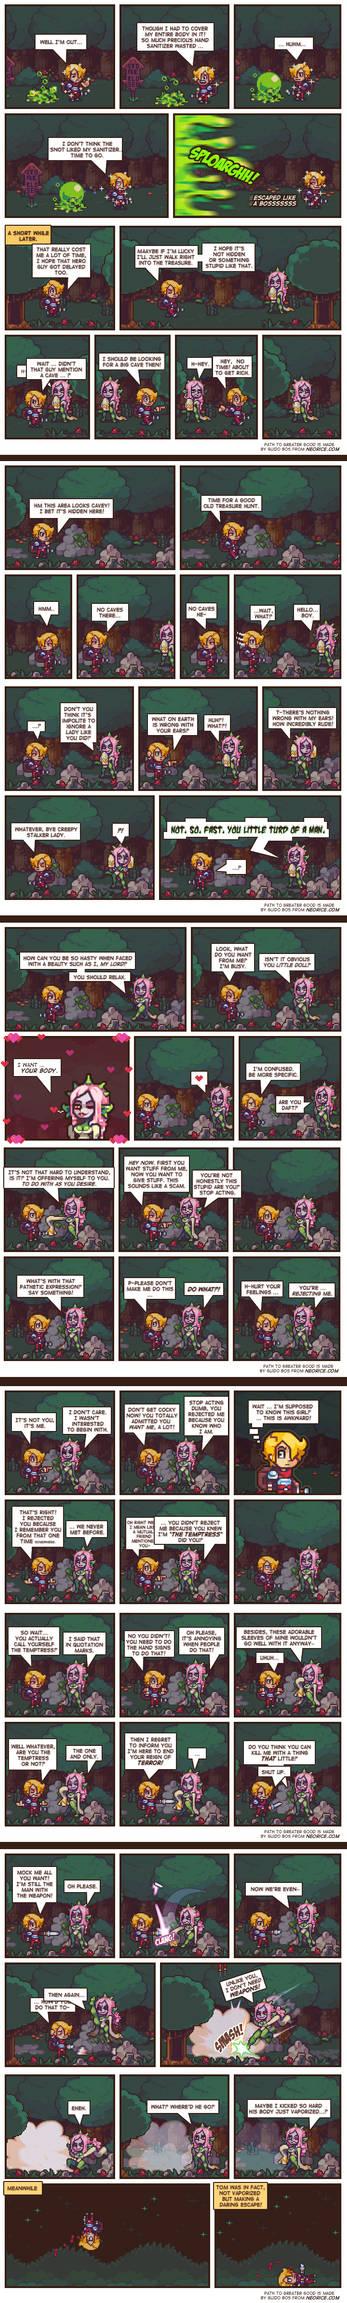 TOM RPG page 41-50